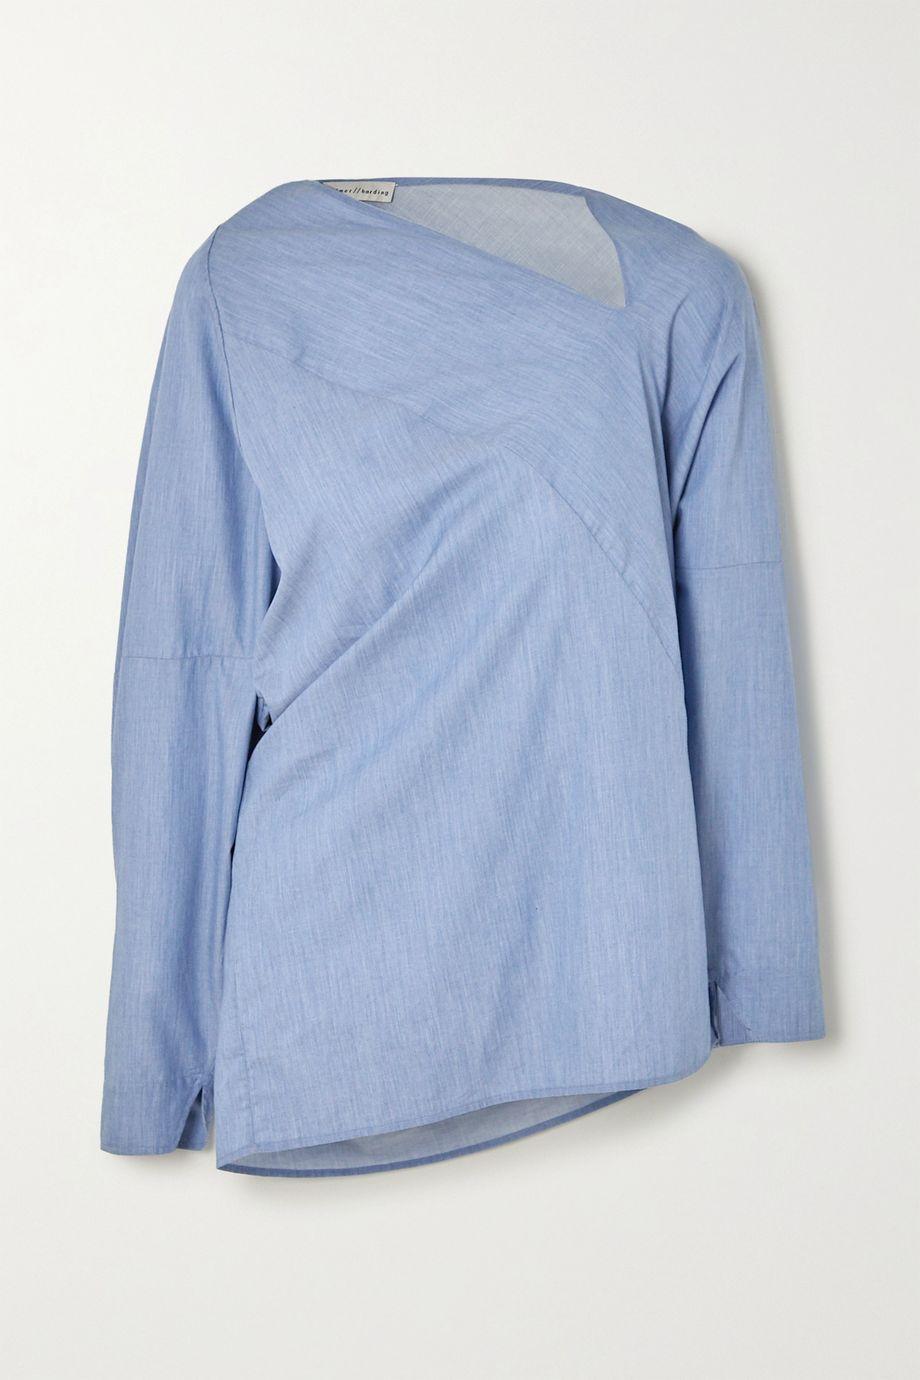 palmer//harding Triangle asymmetric cotton-chambray shirt